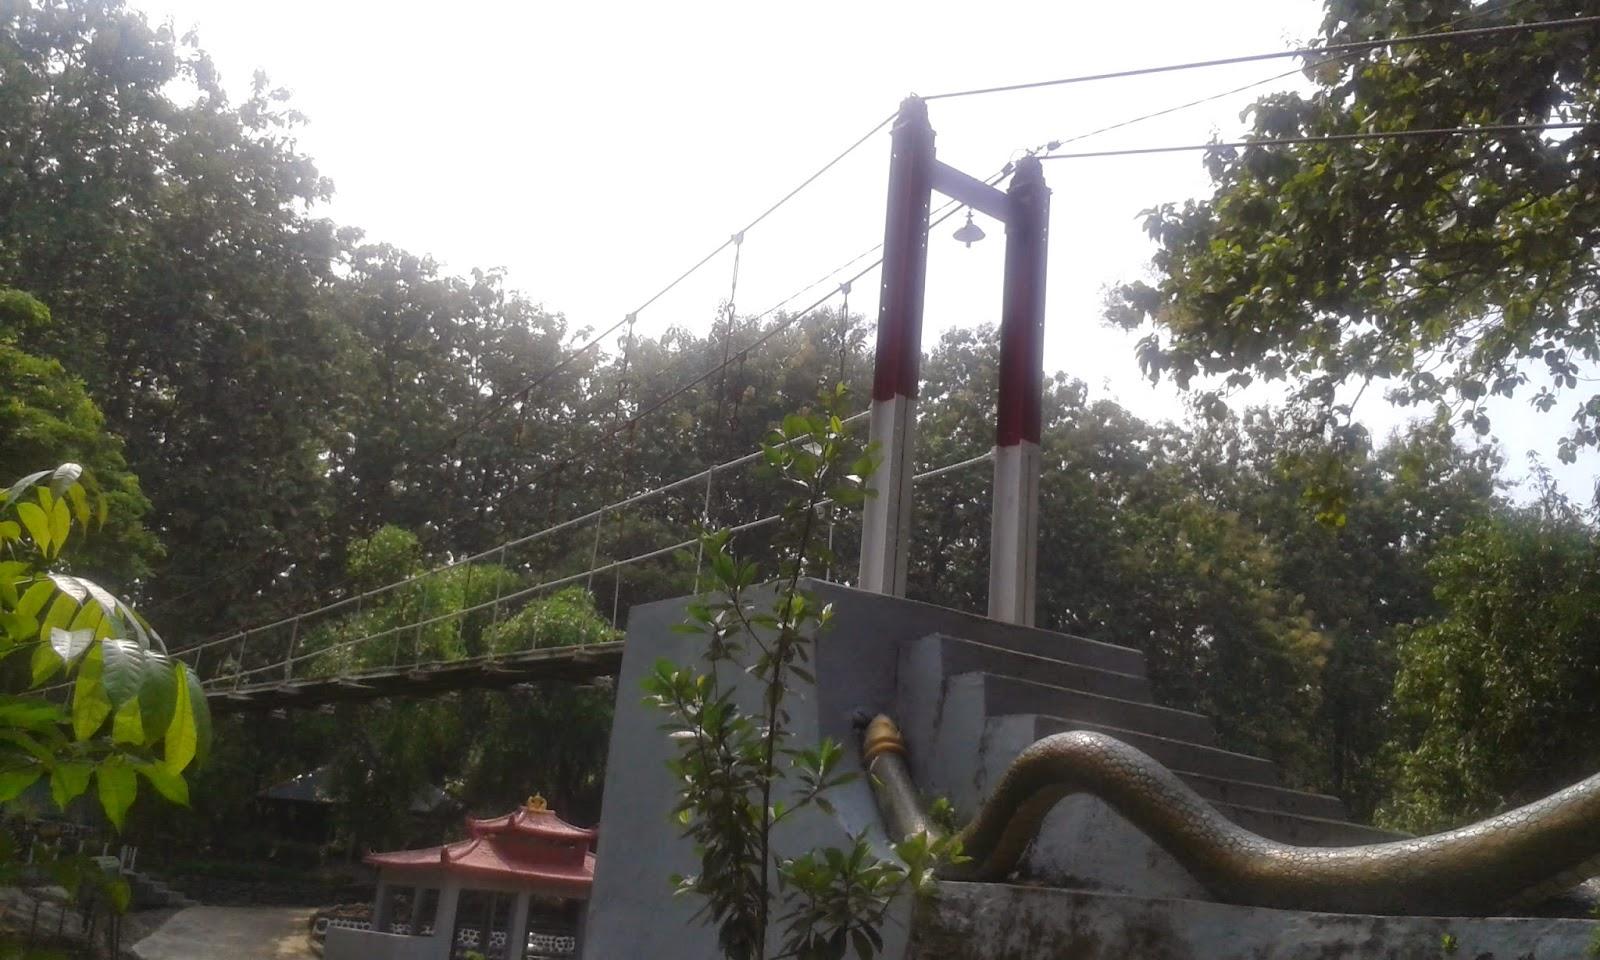 Srigati Hutan Angker Kabupaten Ngawi 97 Indah Berlokasi Umbul Jambe